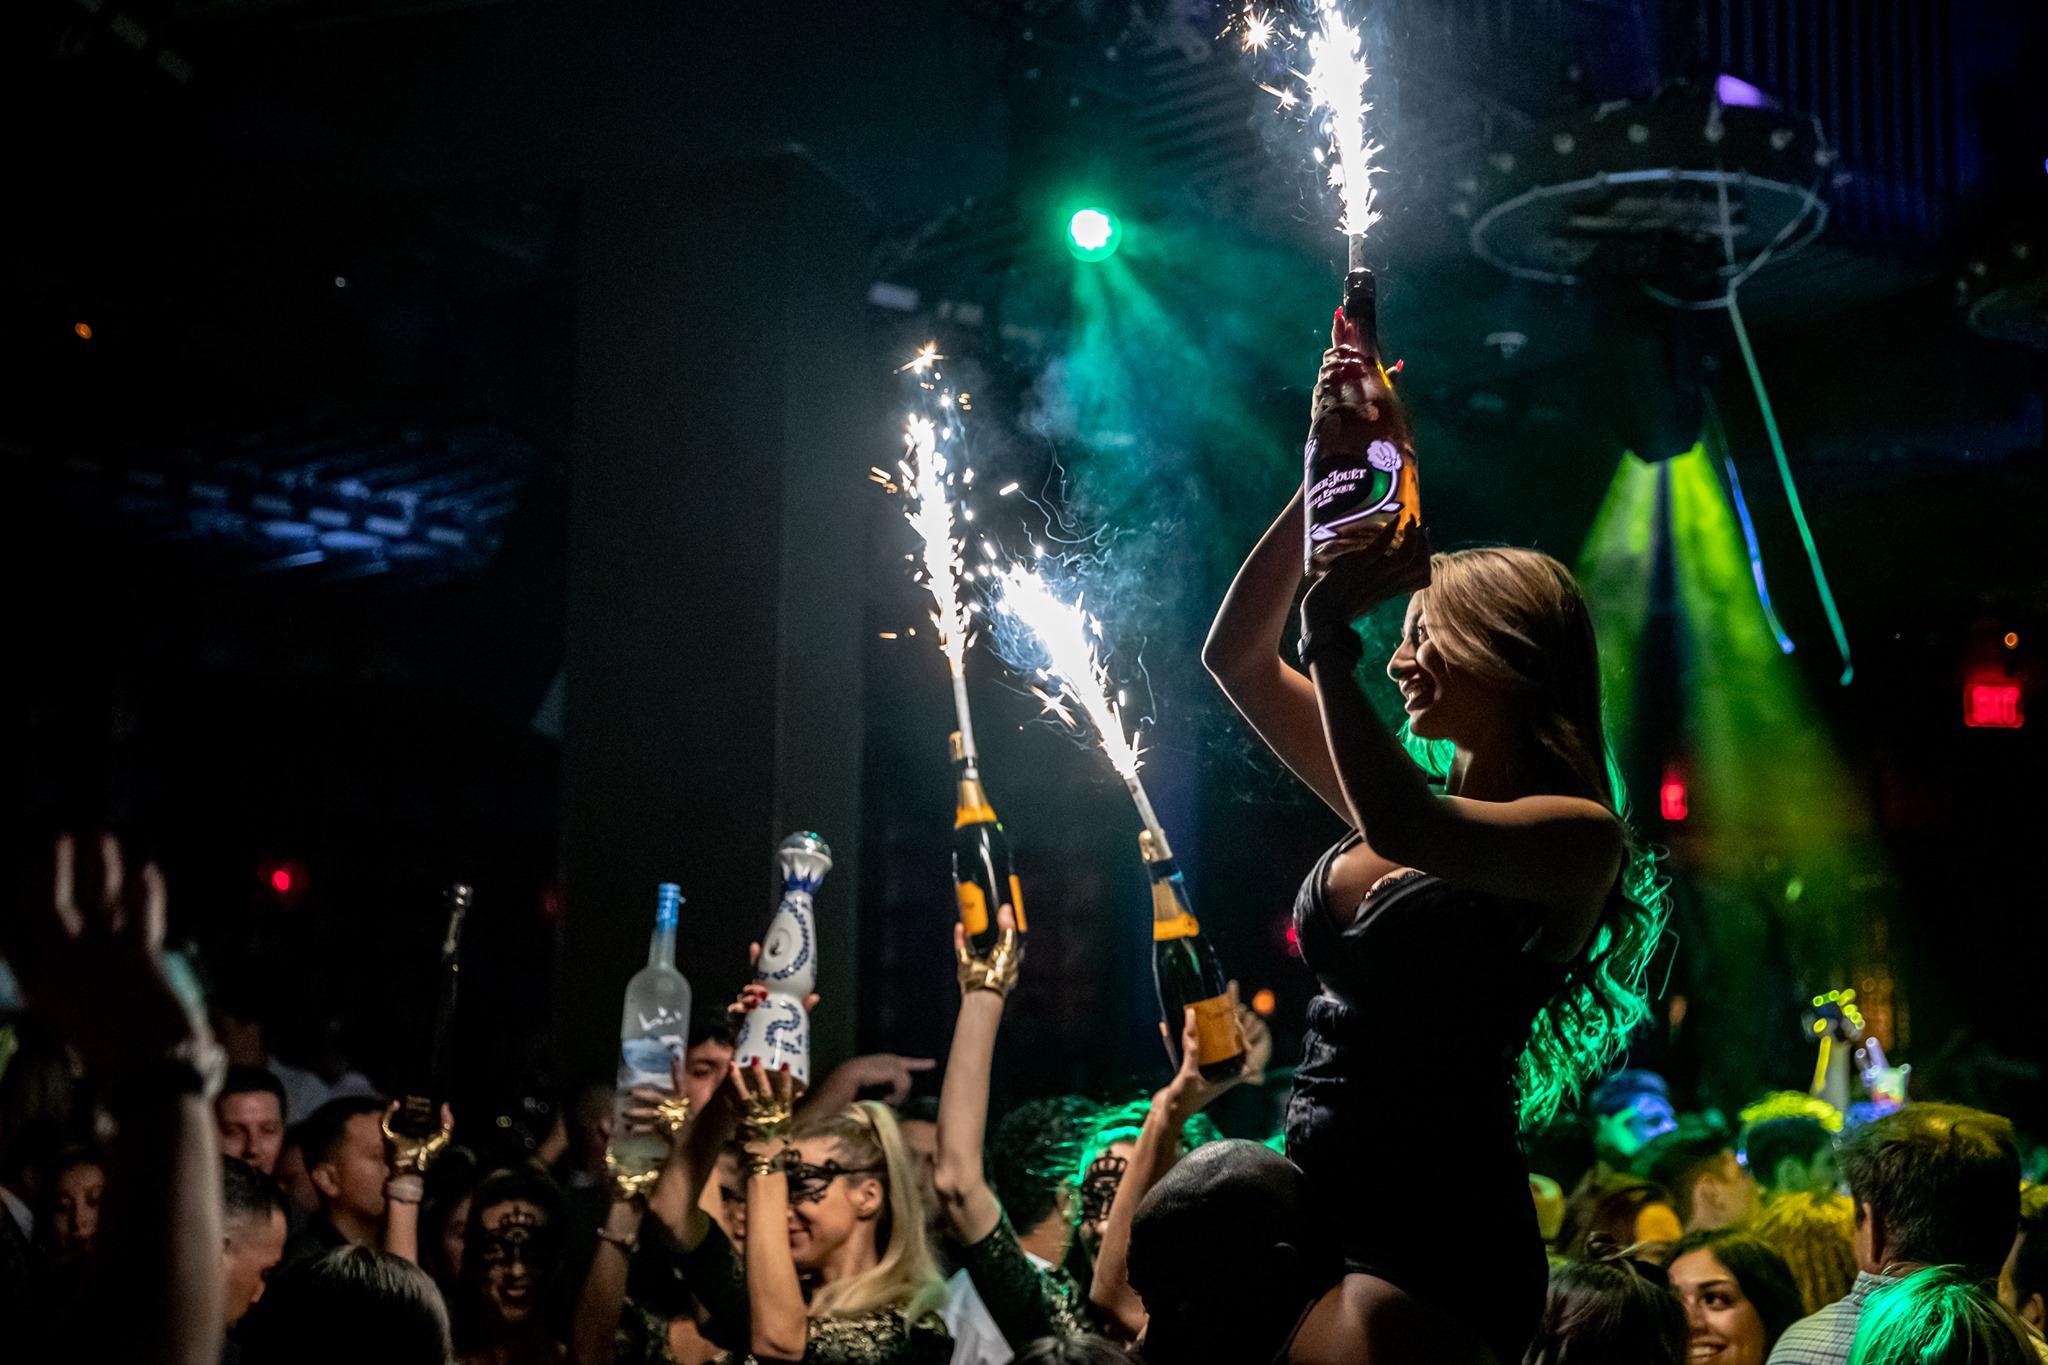 bottle service at marquee nightclub